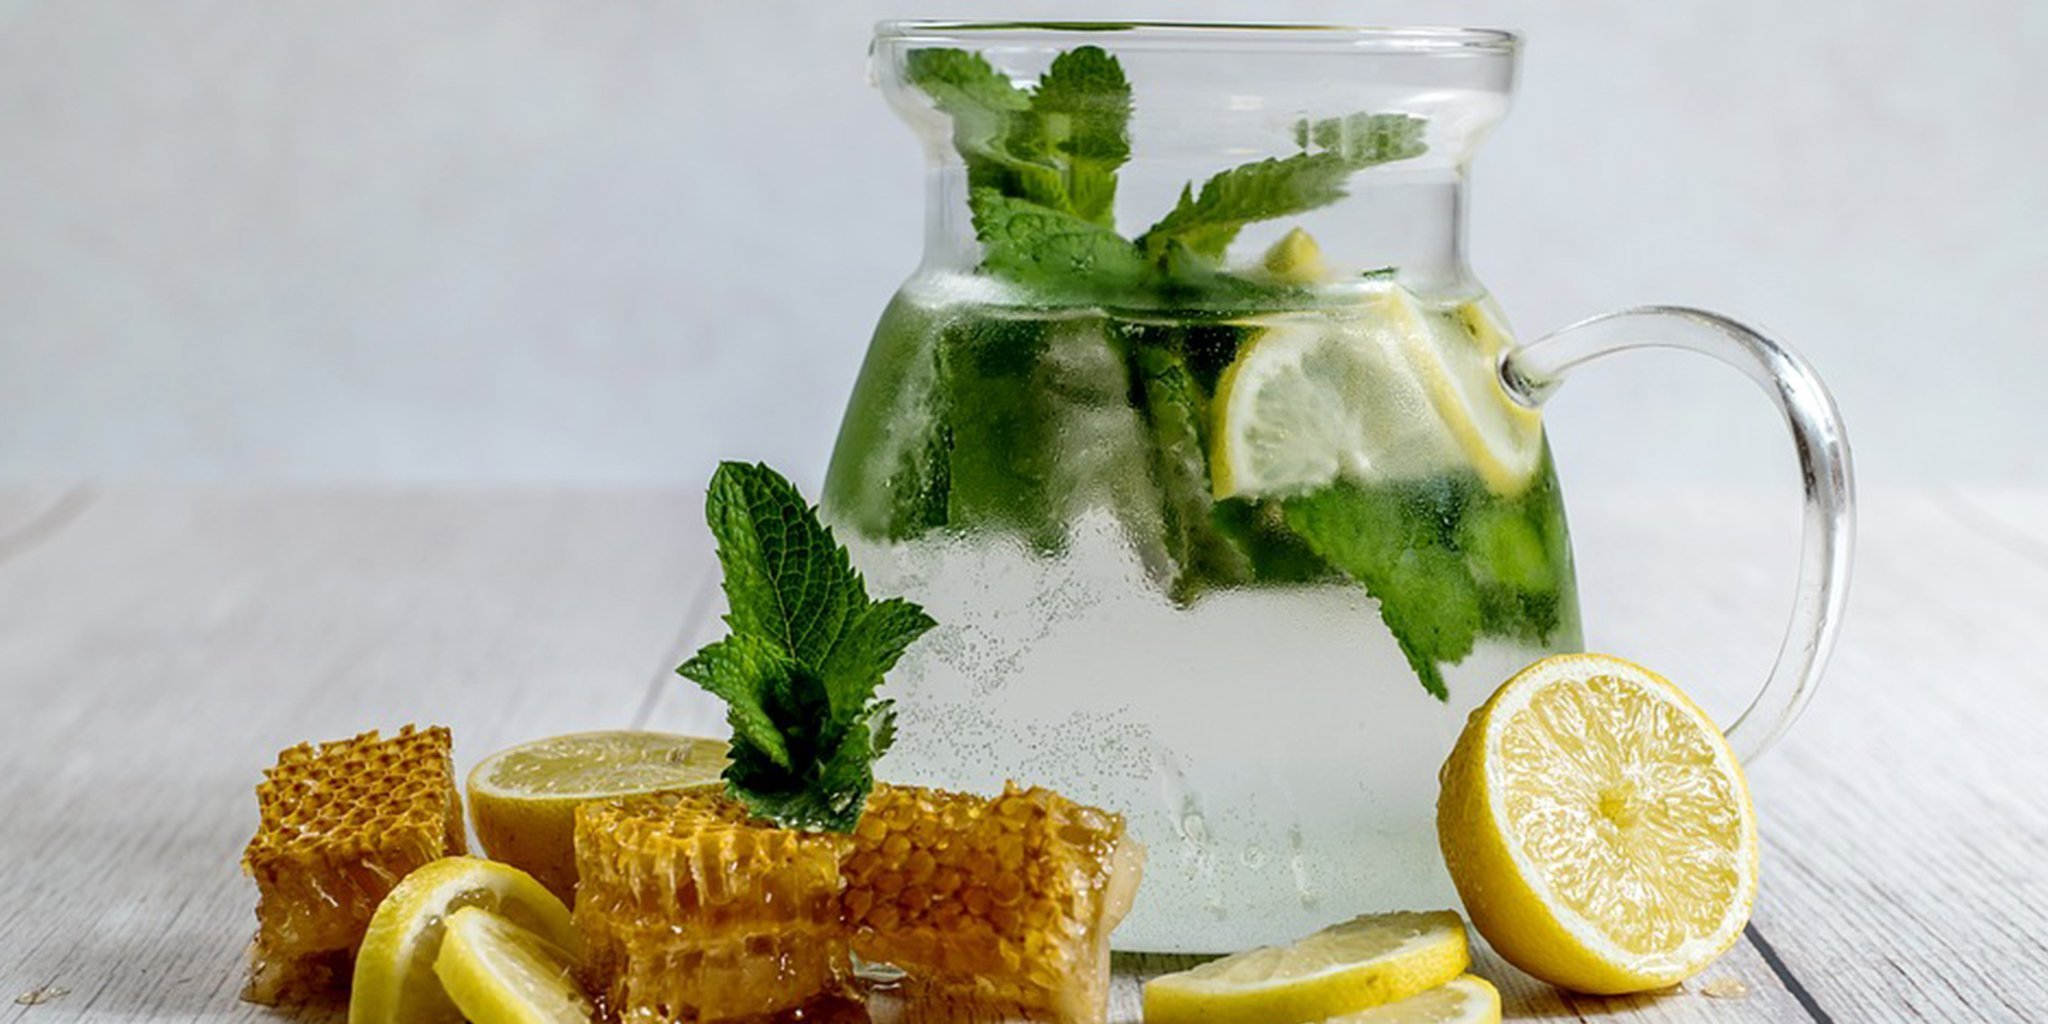 Best Foods to Detoxify the Body